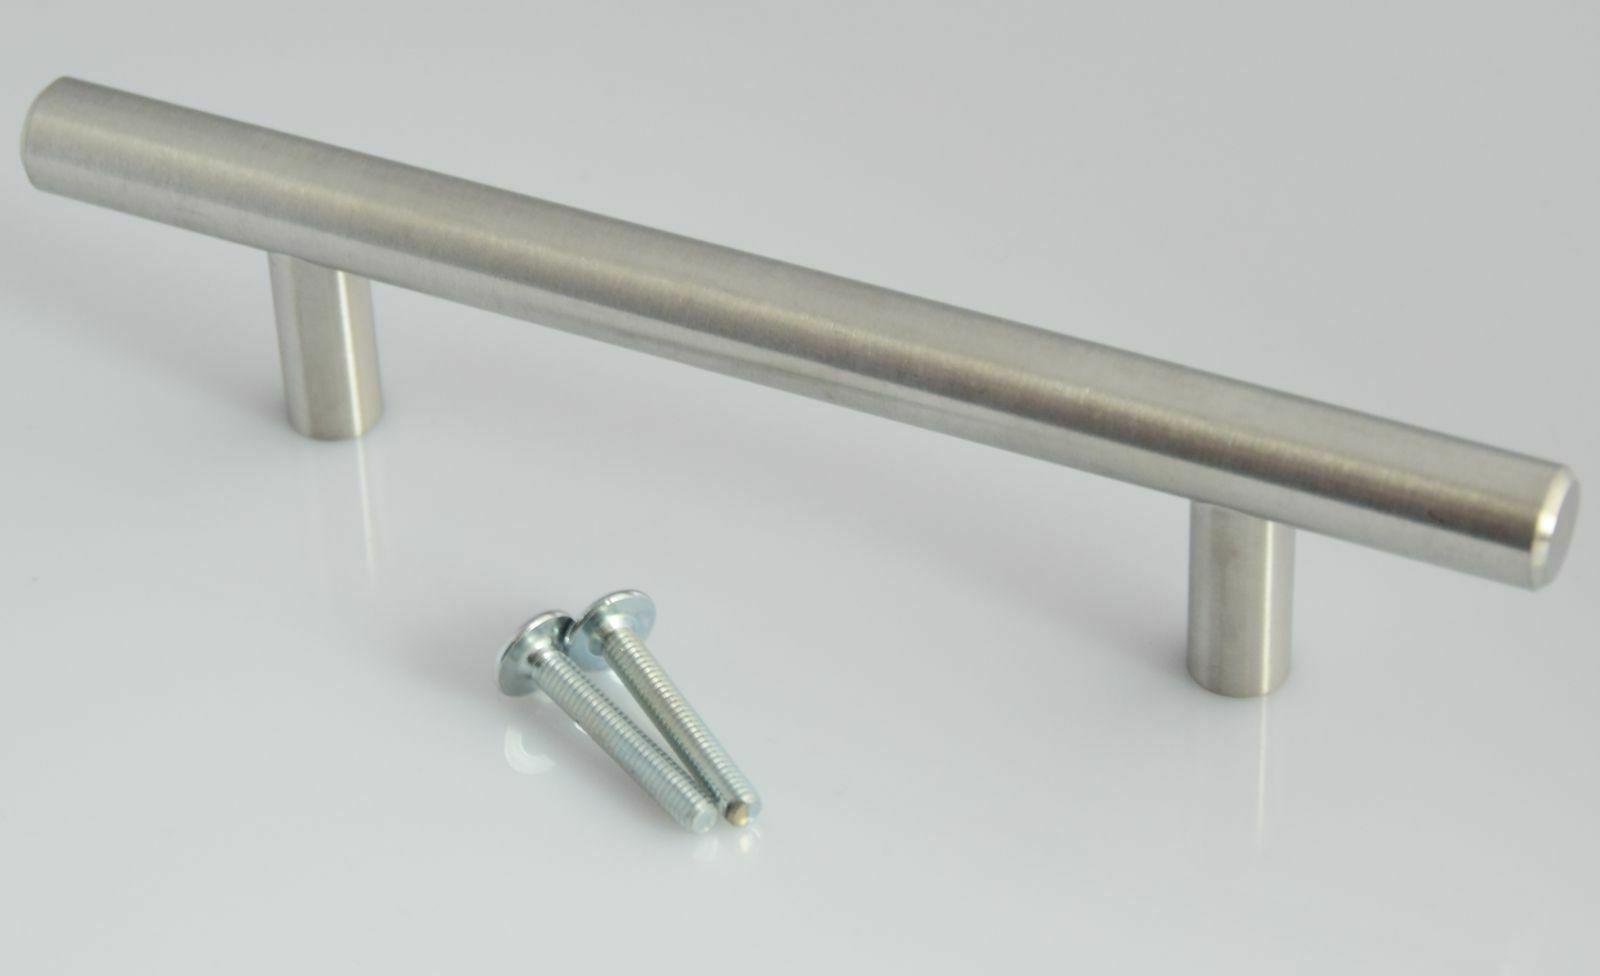 SO-TECH/® M/öbelgriff E3 echt Edelstahl BA 384 mm Stangengriff Relinggriff Profil 15 x 15 mm